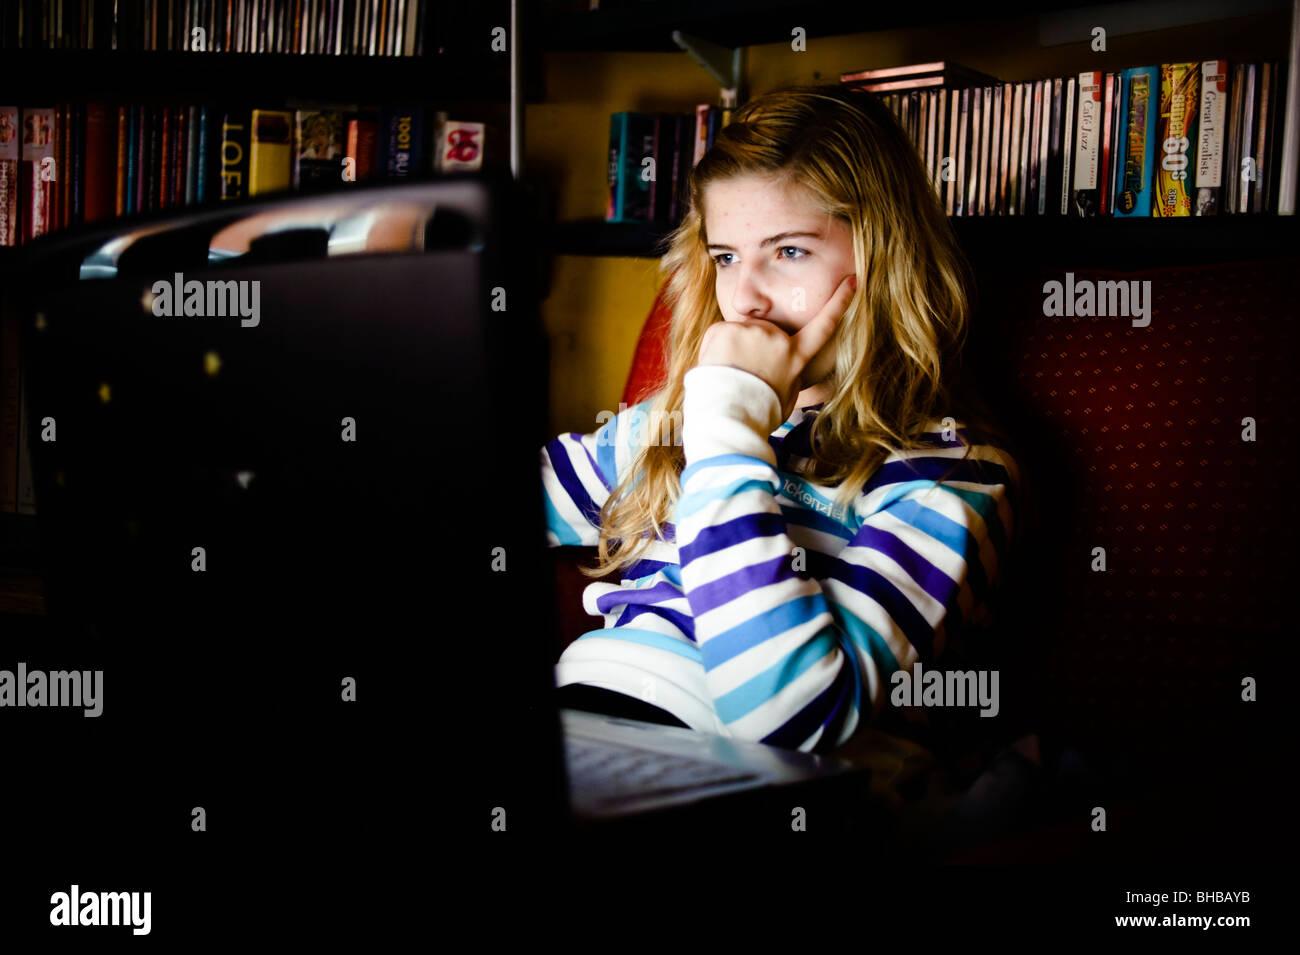 Teenage girl using a laptop computer at home, UK - vérification de son compte de réseau social Facebook Photo Stock